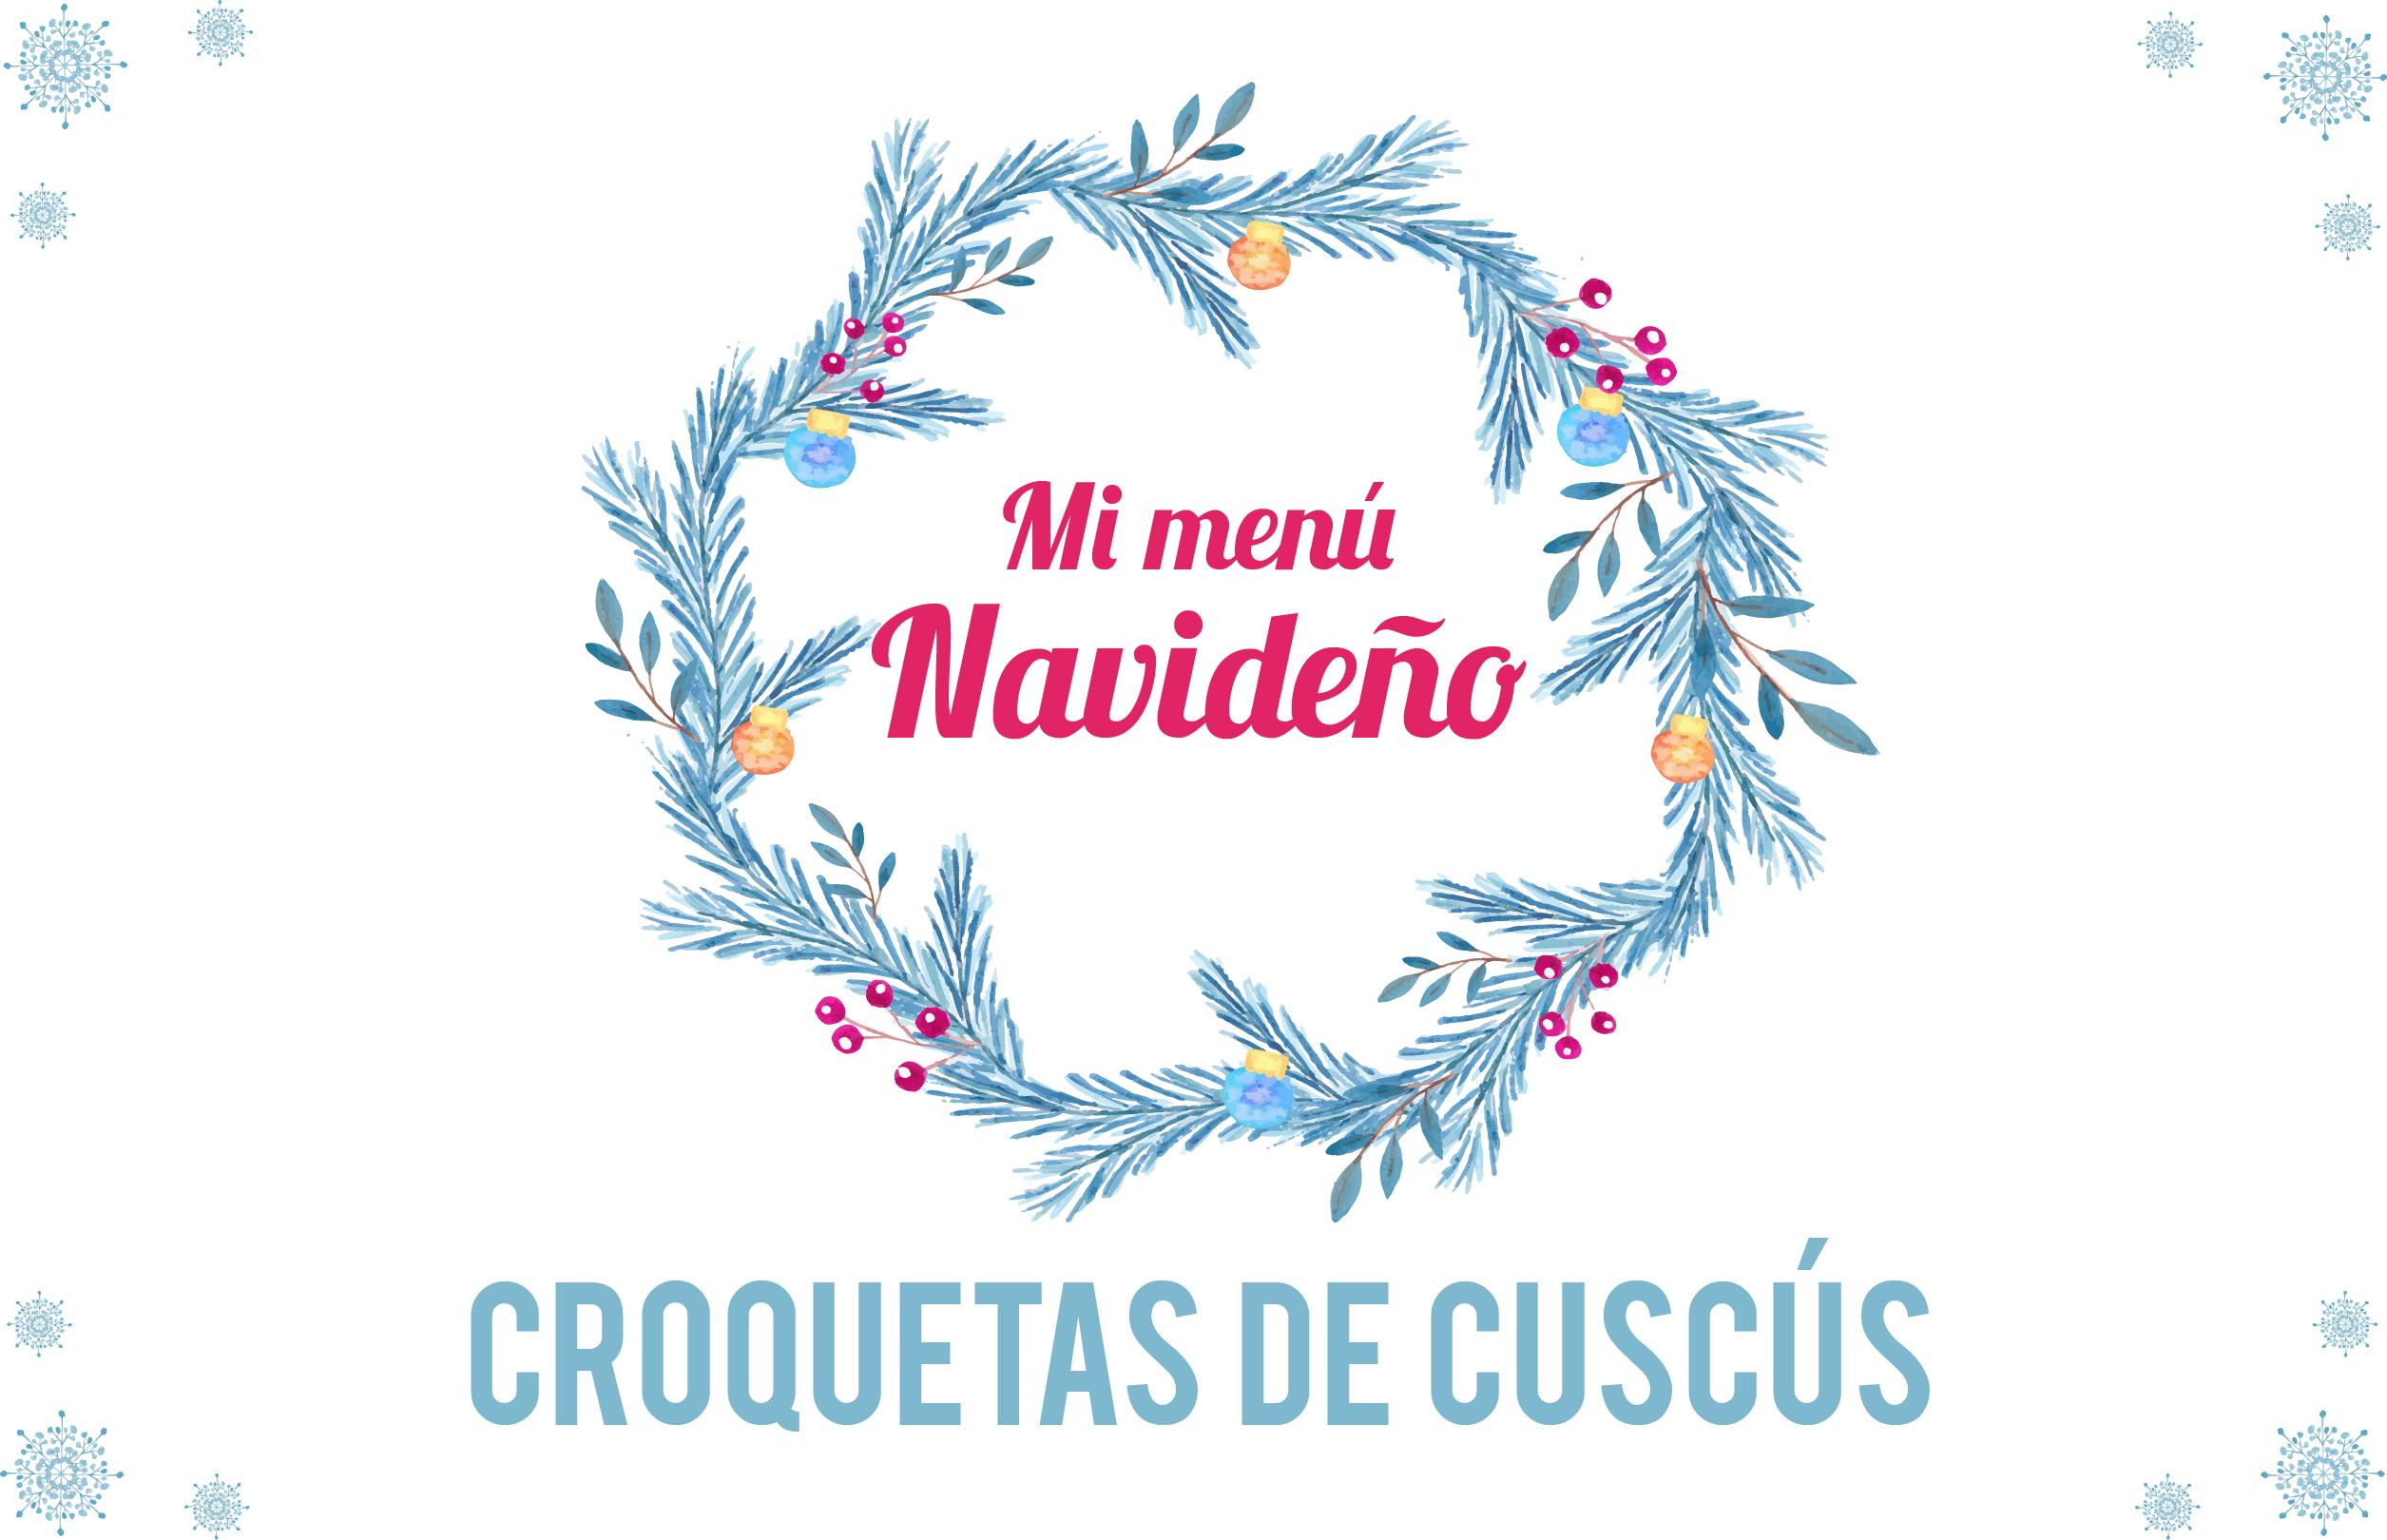 1croquetas-de-cuscus